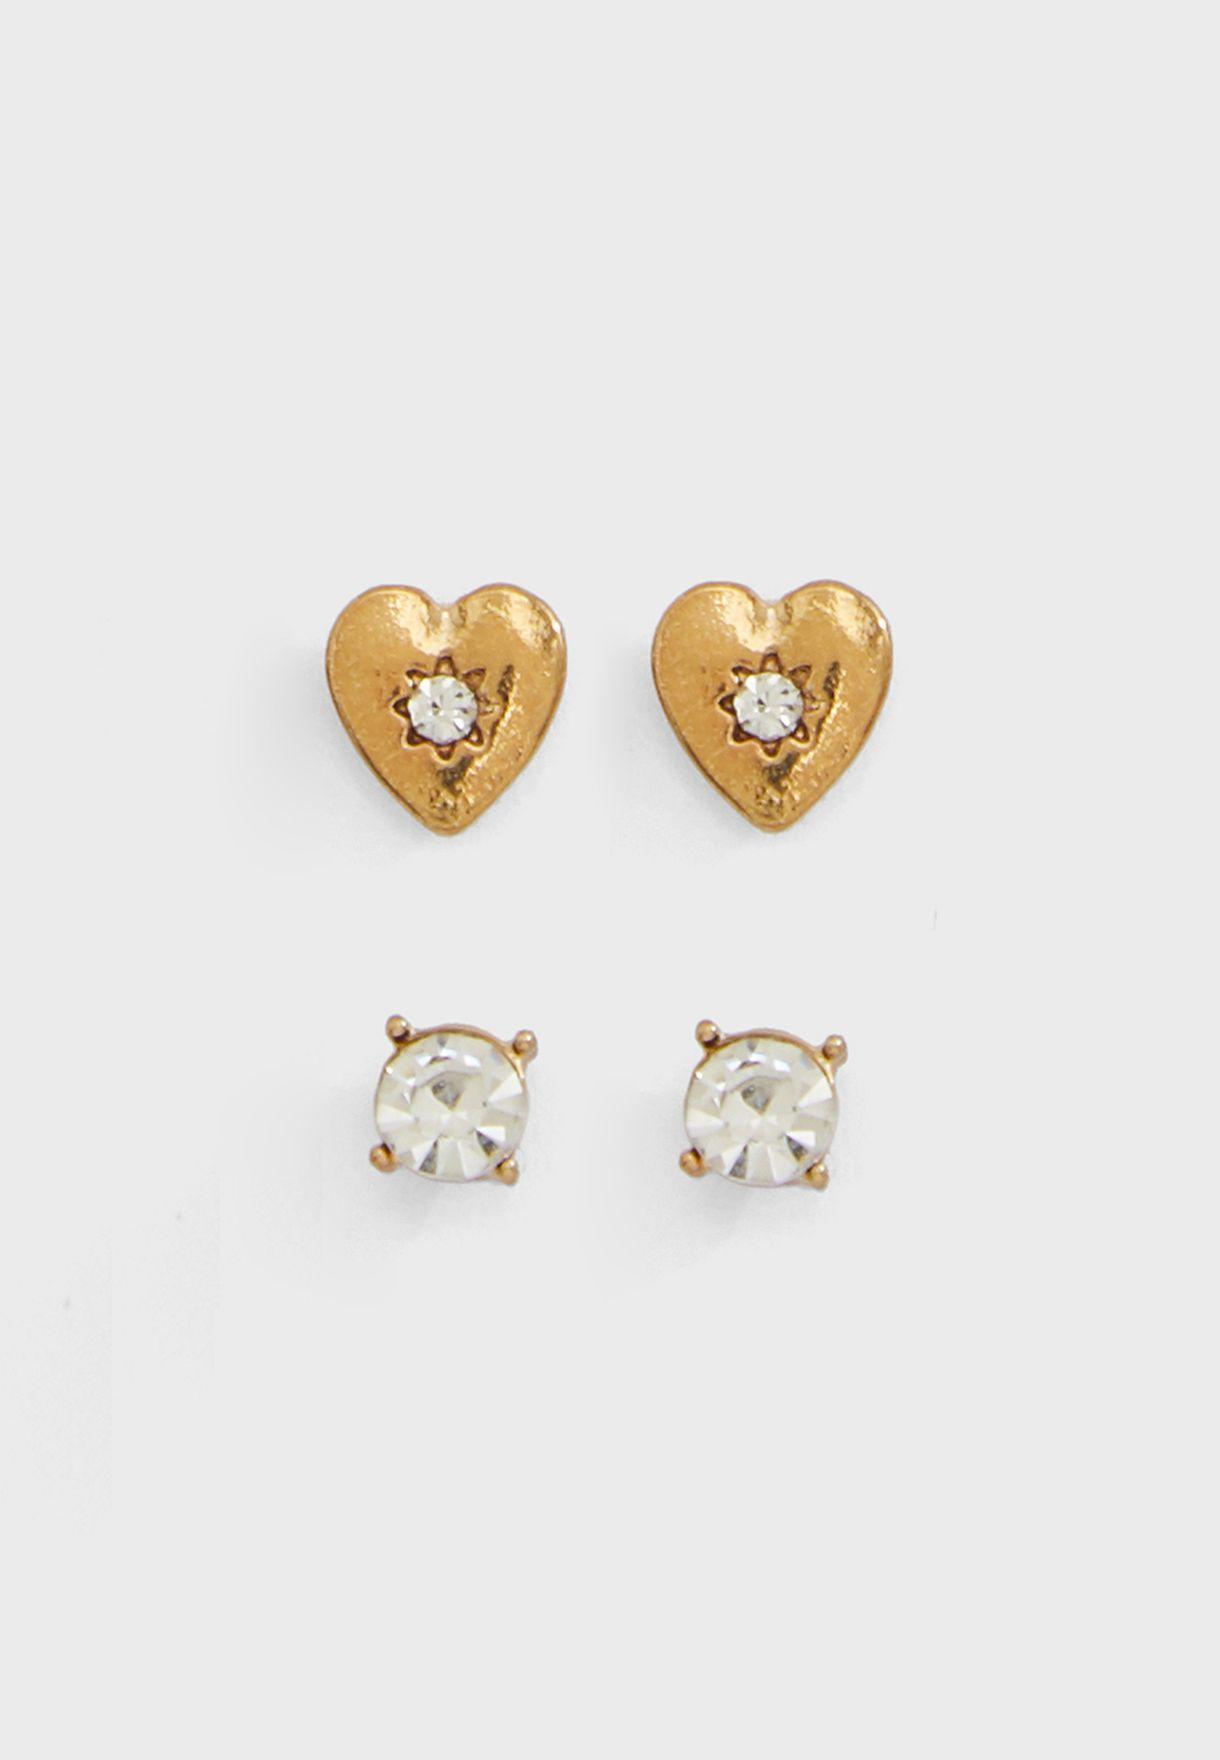 Heart Charm Necklaces & Earrings Set